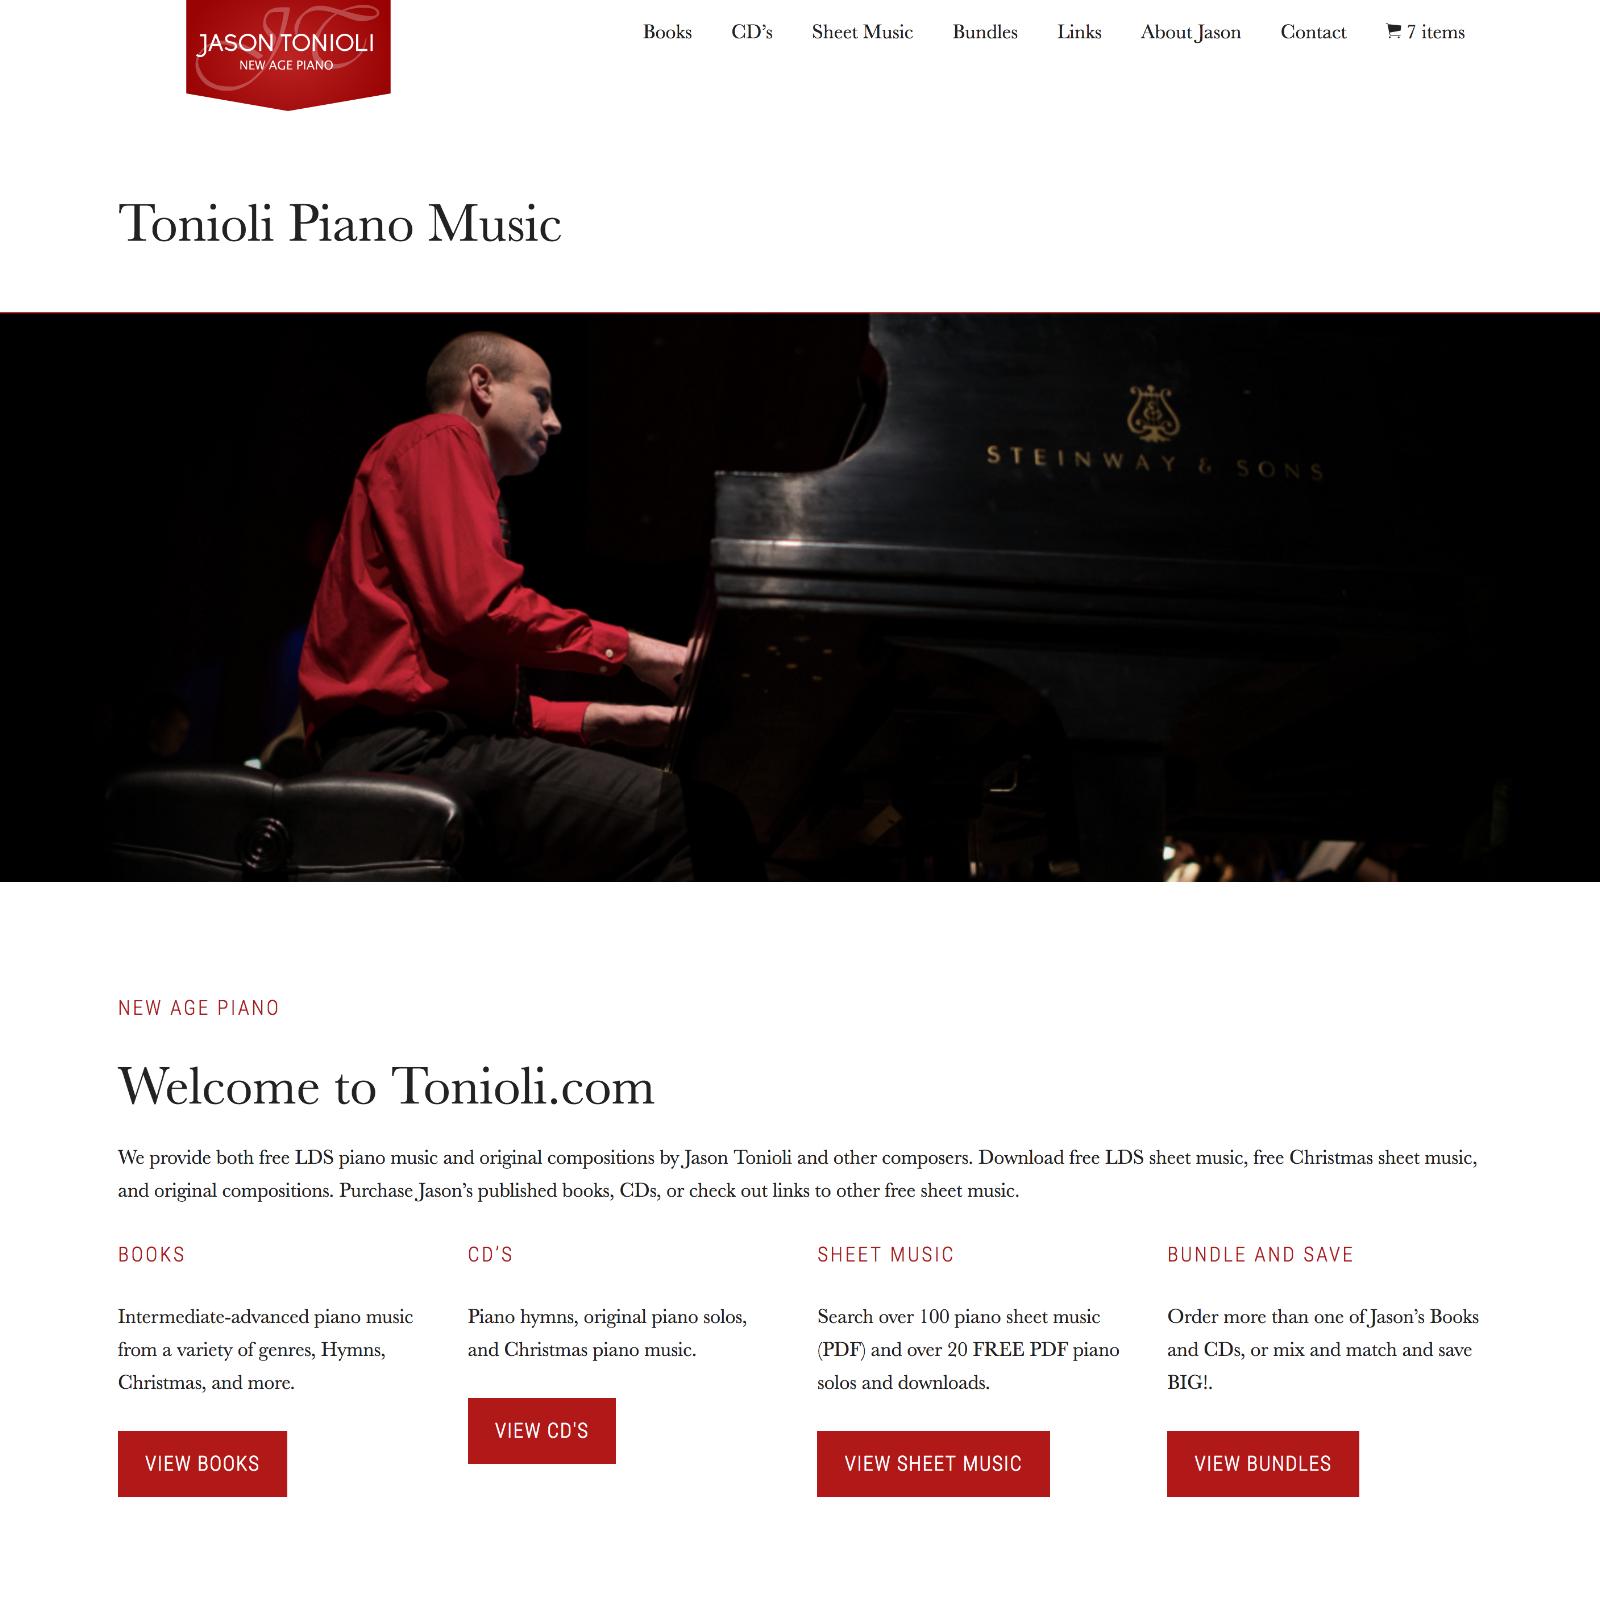 Tonioli com - Piano Hymn Arrangements and other Piano Solos